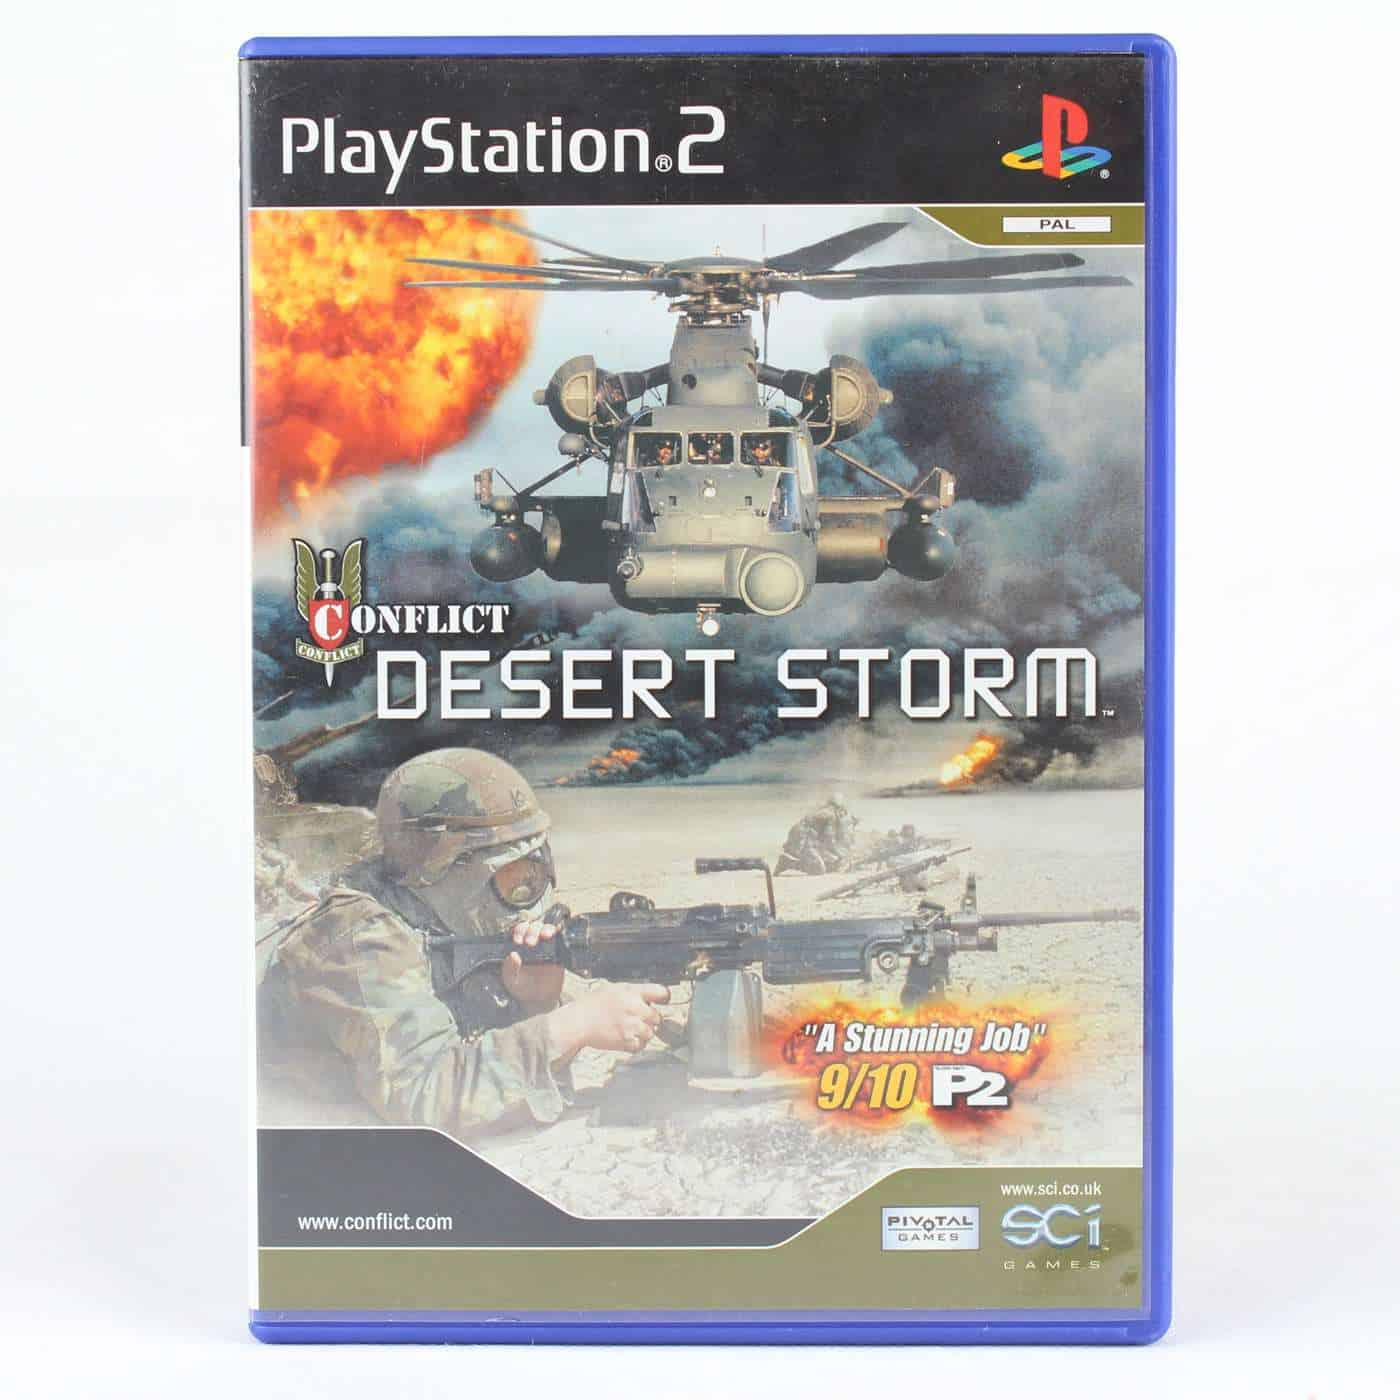 Conflict: Desert Storm (Playstation 2)